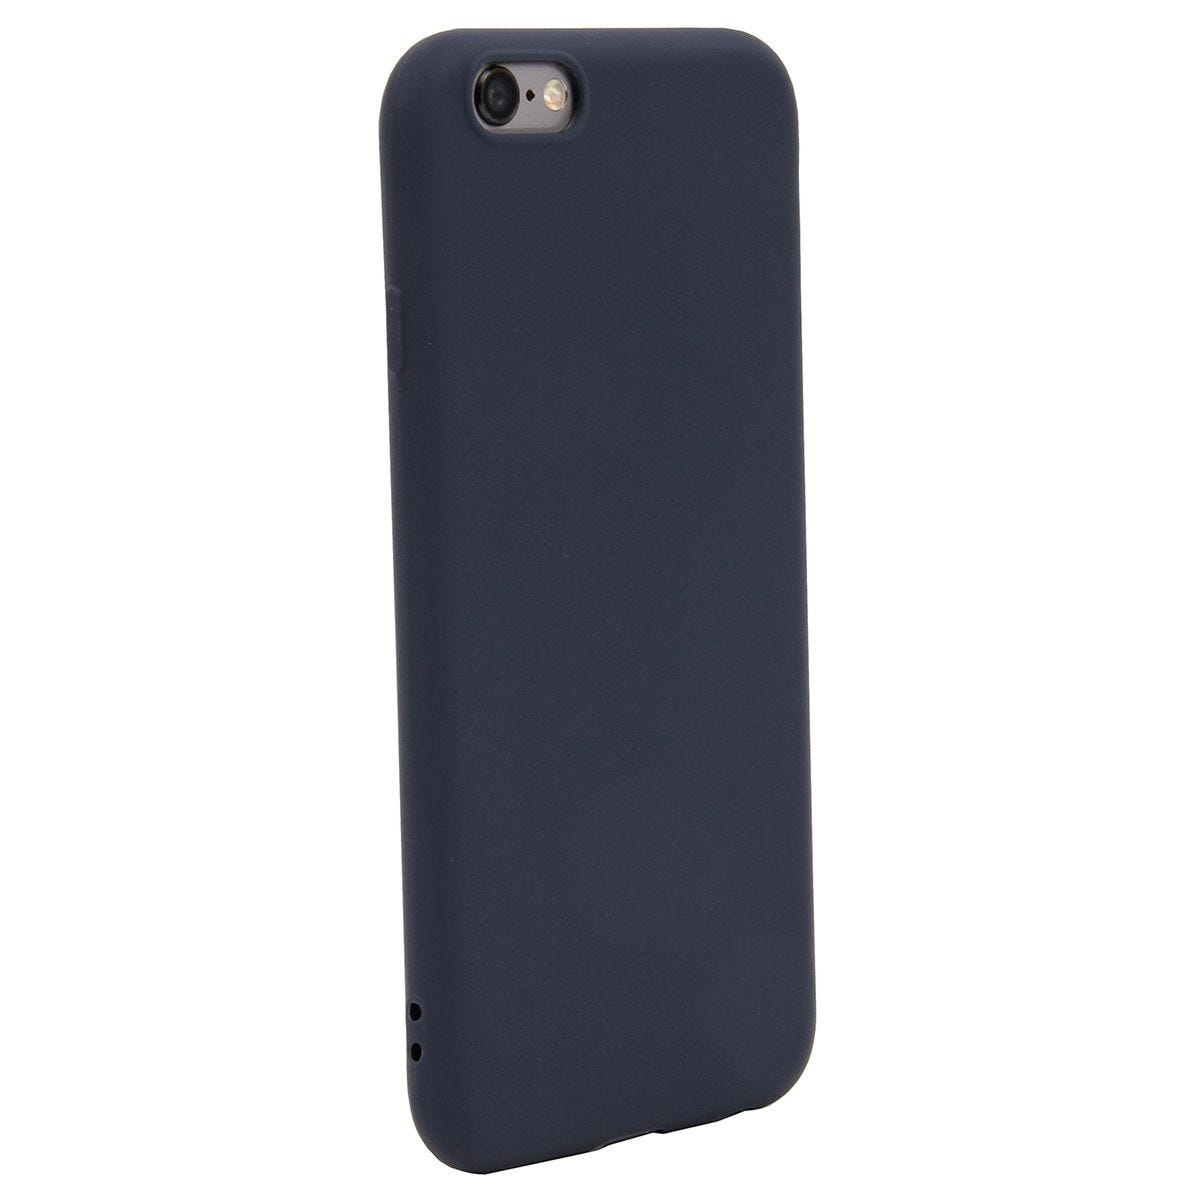 Case Flexi Cobalt Blue for iPhone 6